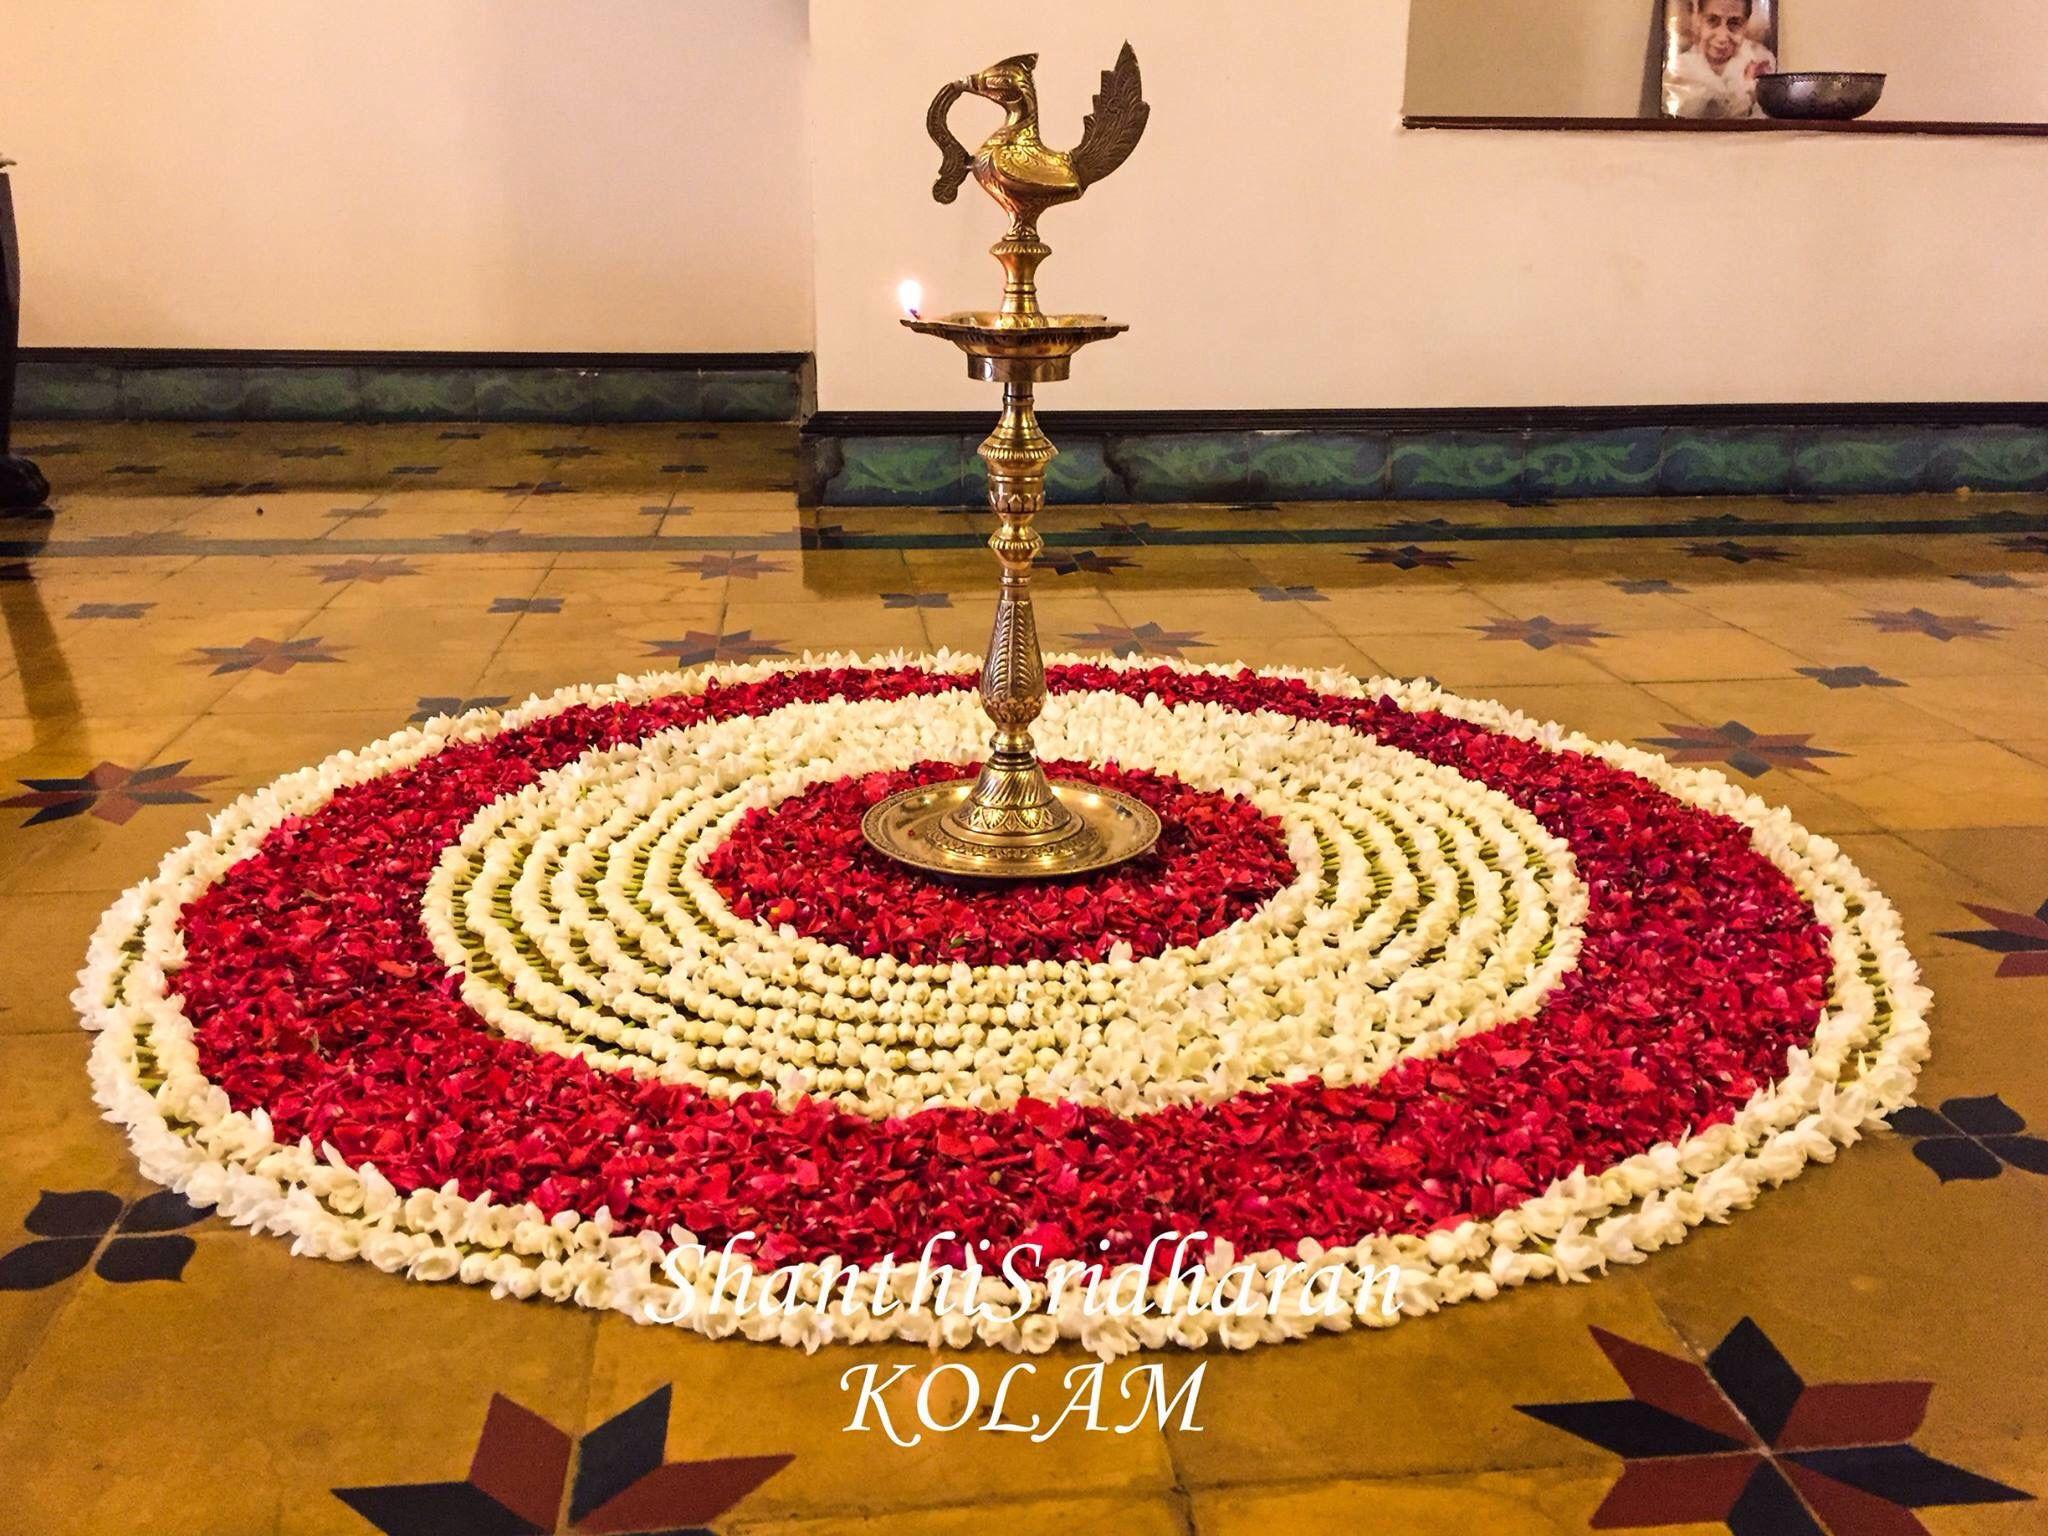 Pin By Nidhi Bhatt On Kolamrangoli Ideas Pinterest Diwali